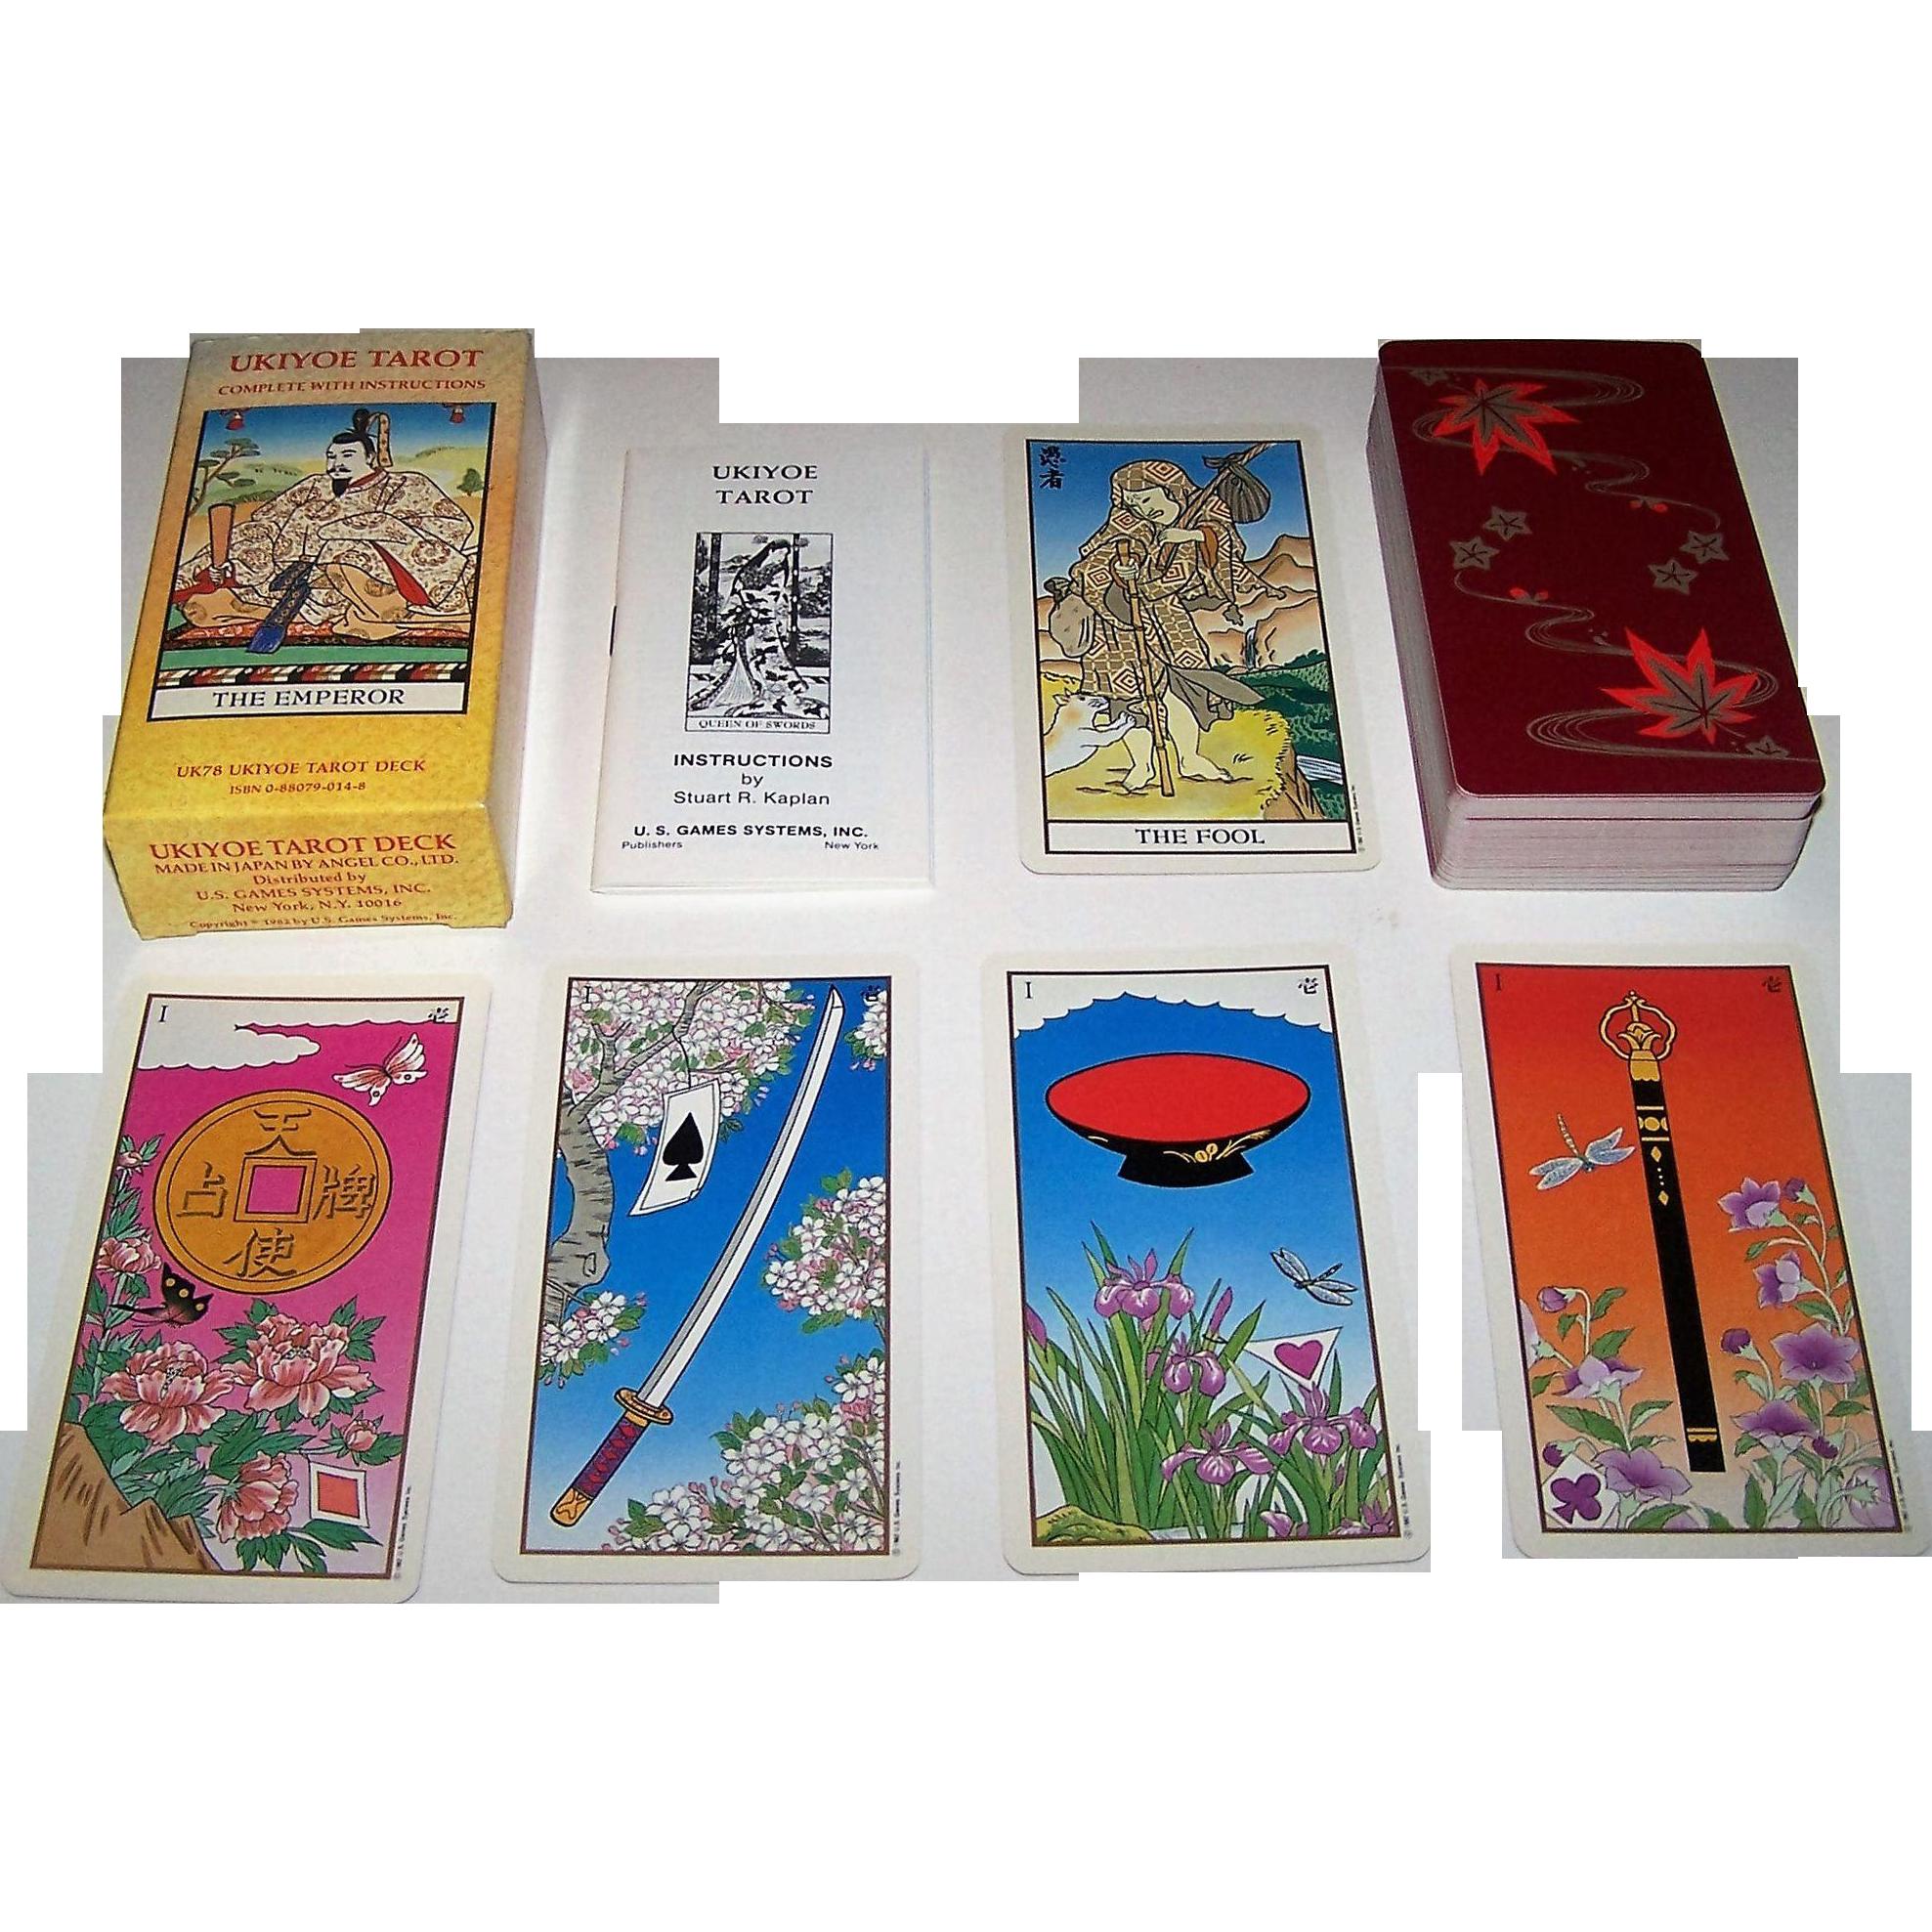 "Angel (U.S. Games Systems) ""Ukiyoe Tarot,"" Tarot Cards, Koji Furuta Designs, c.1982"